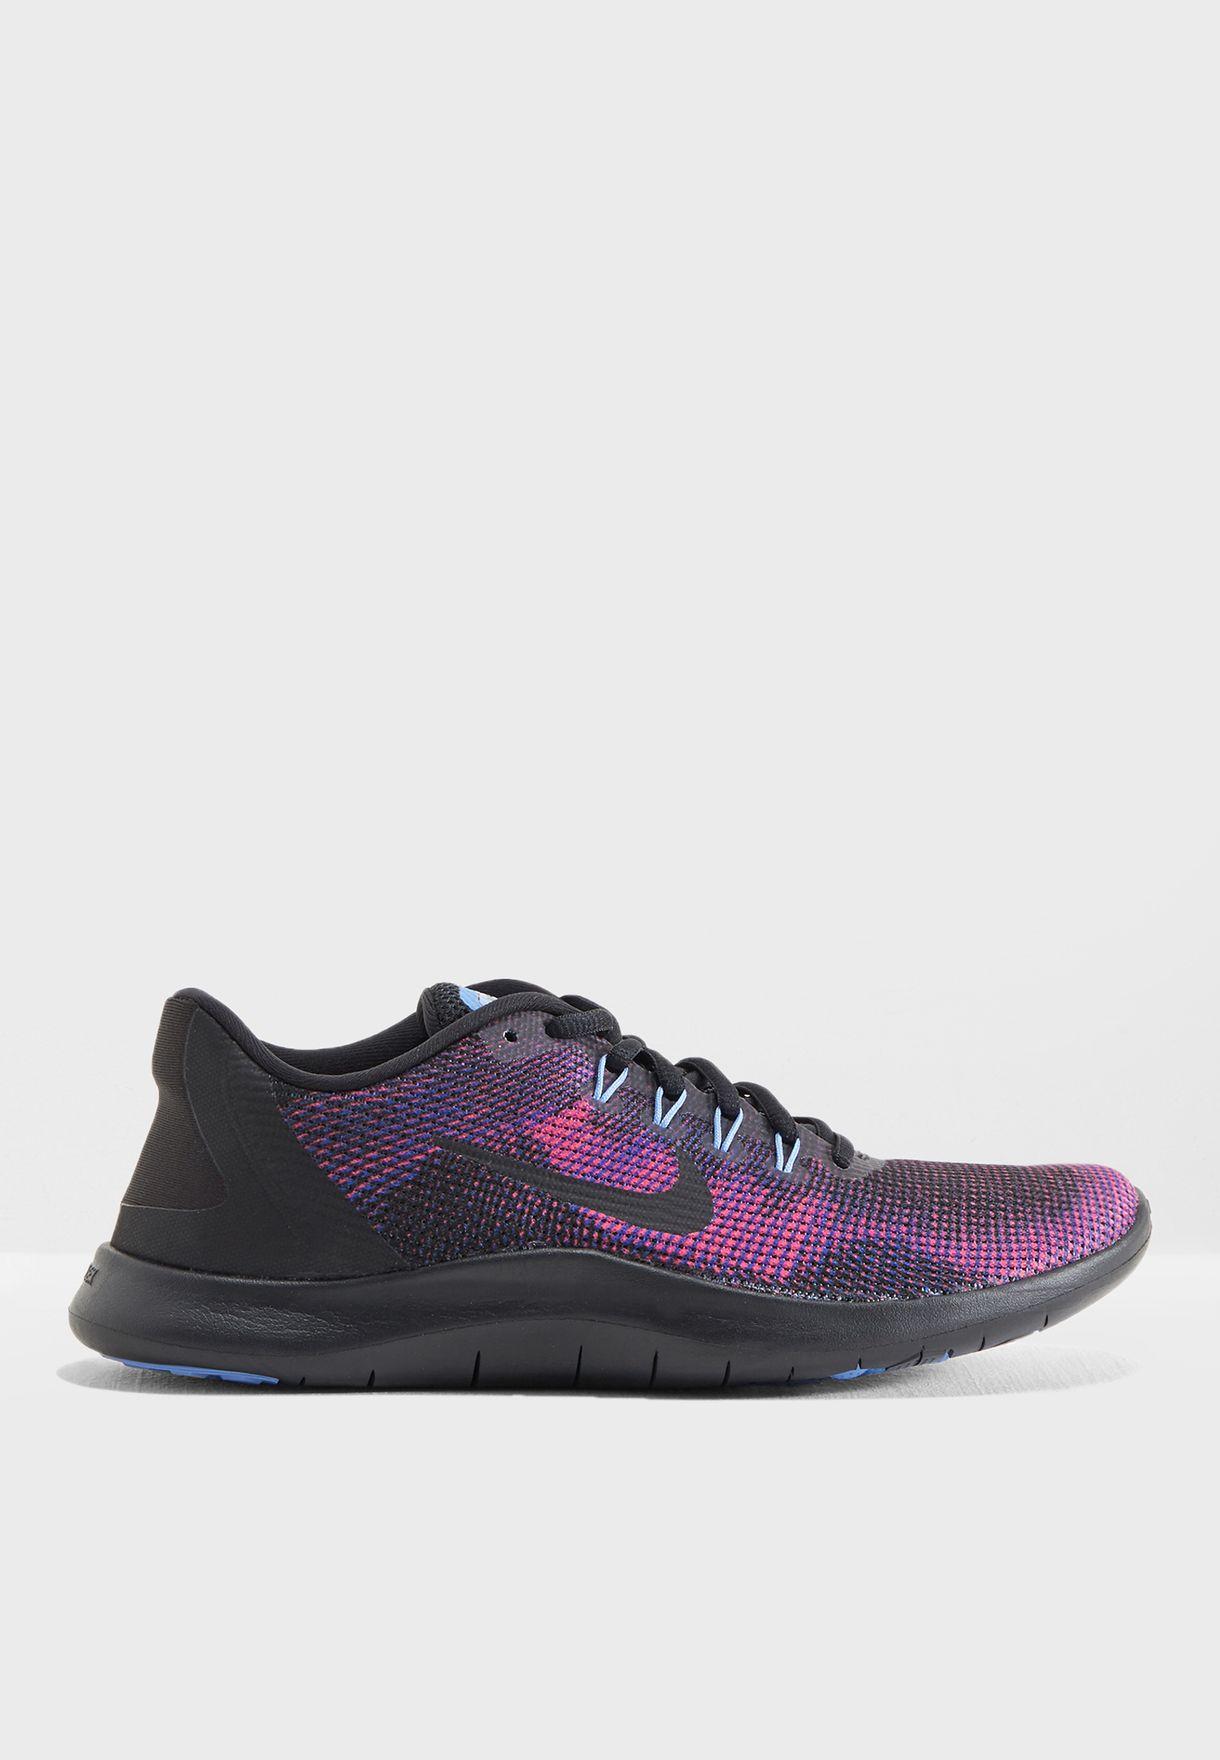 3c0eab1ab8af27 Shop Nike prints Flex 2018 RN AA7408-003 for Women in Saudi ...